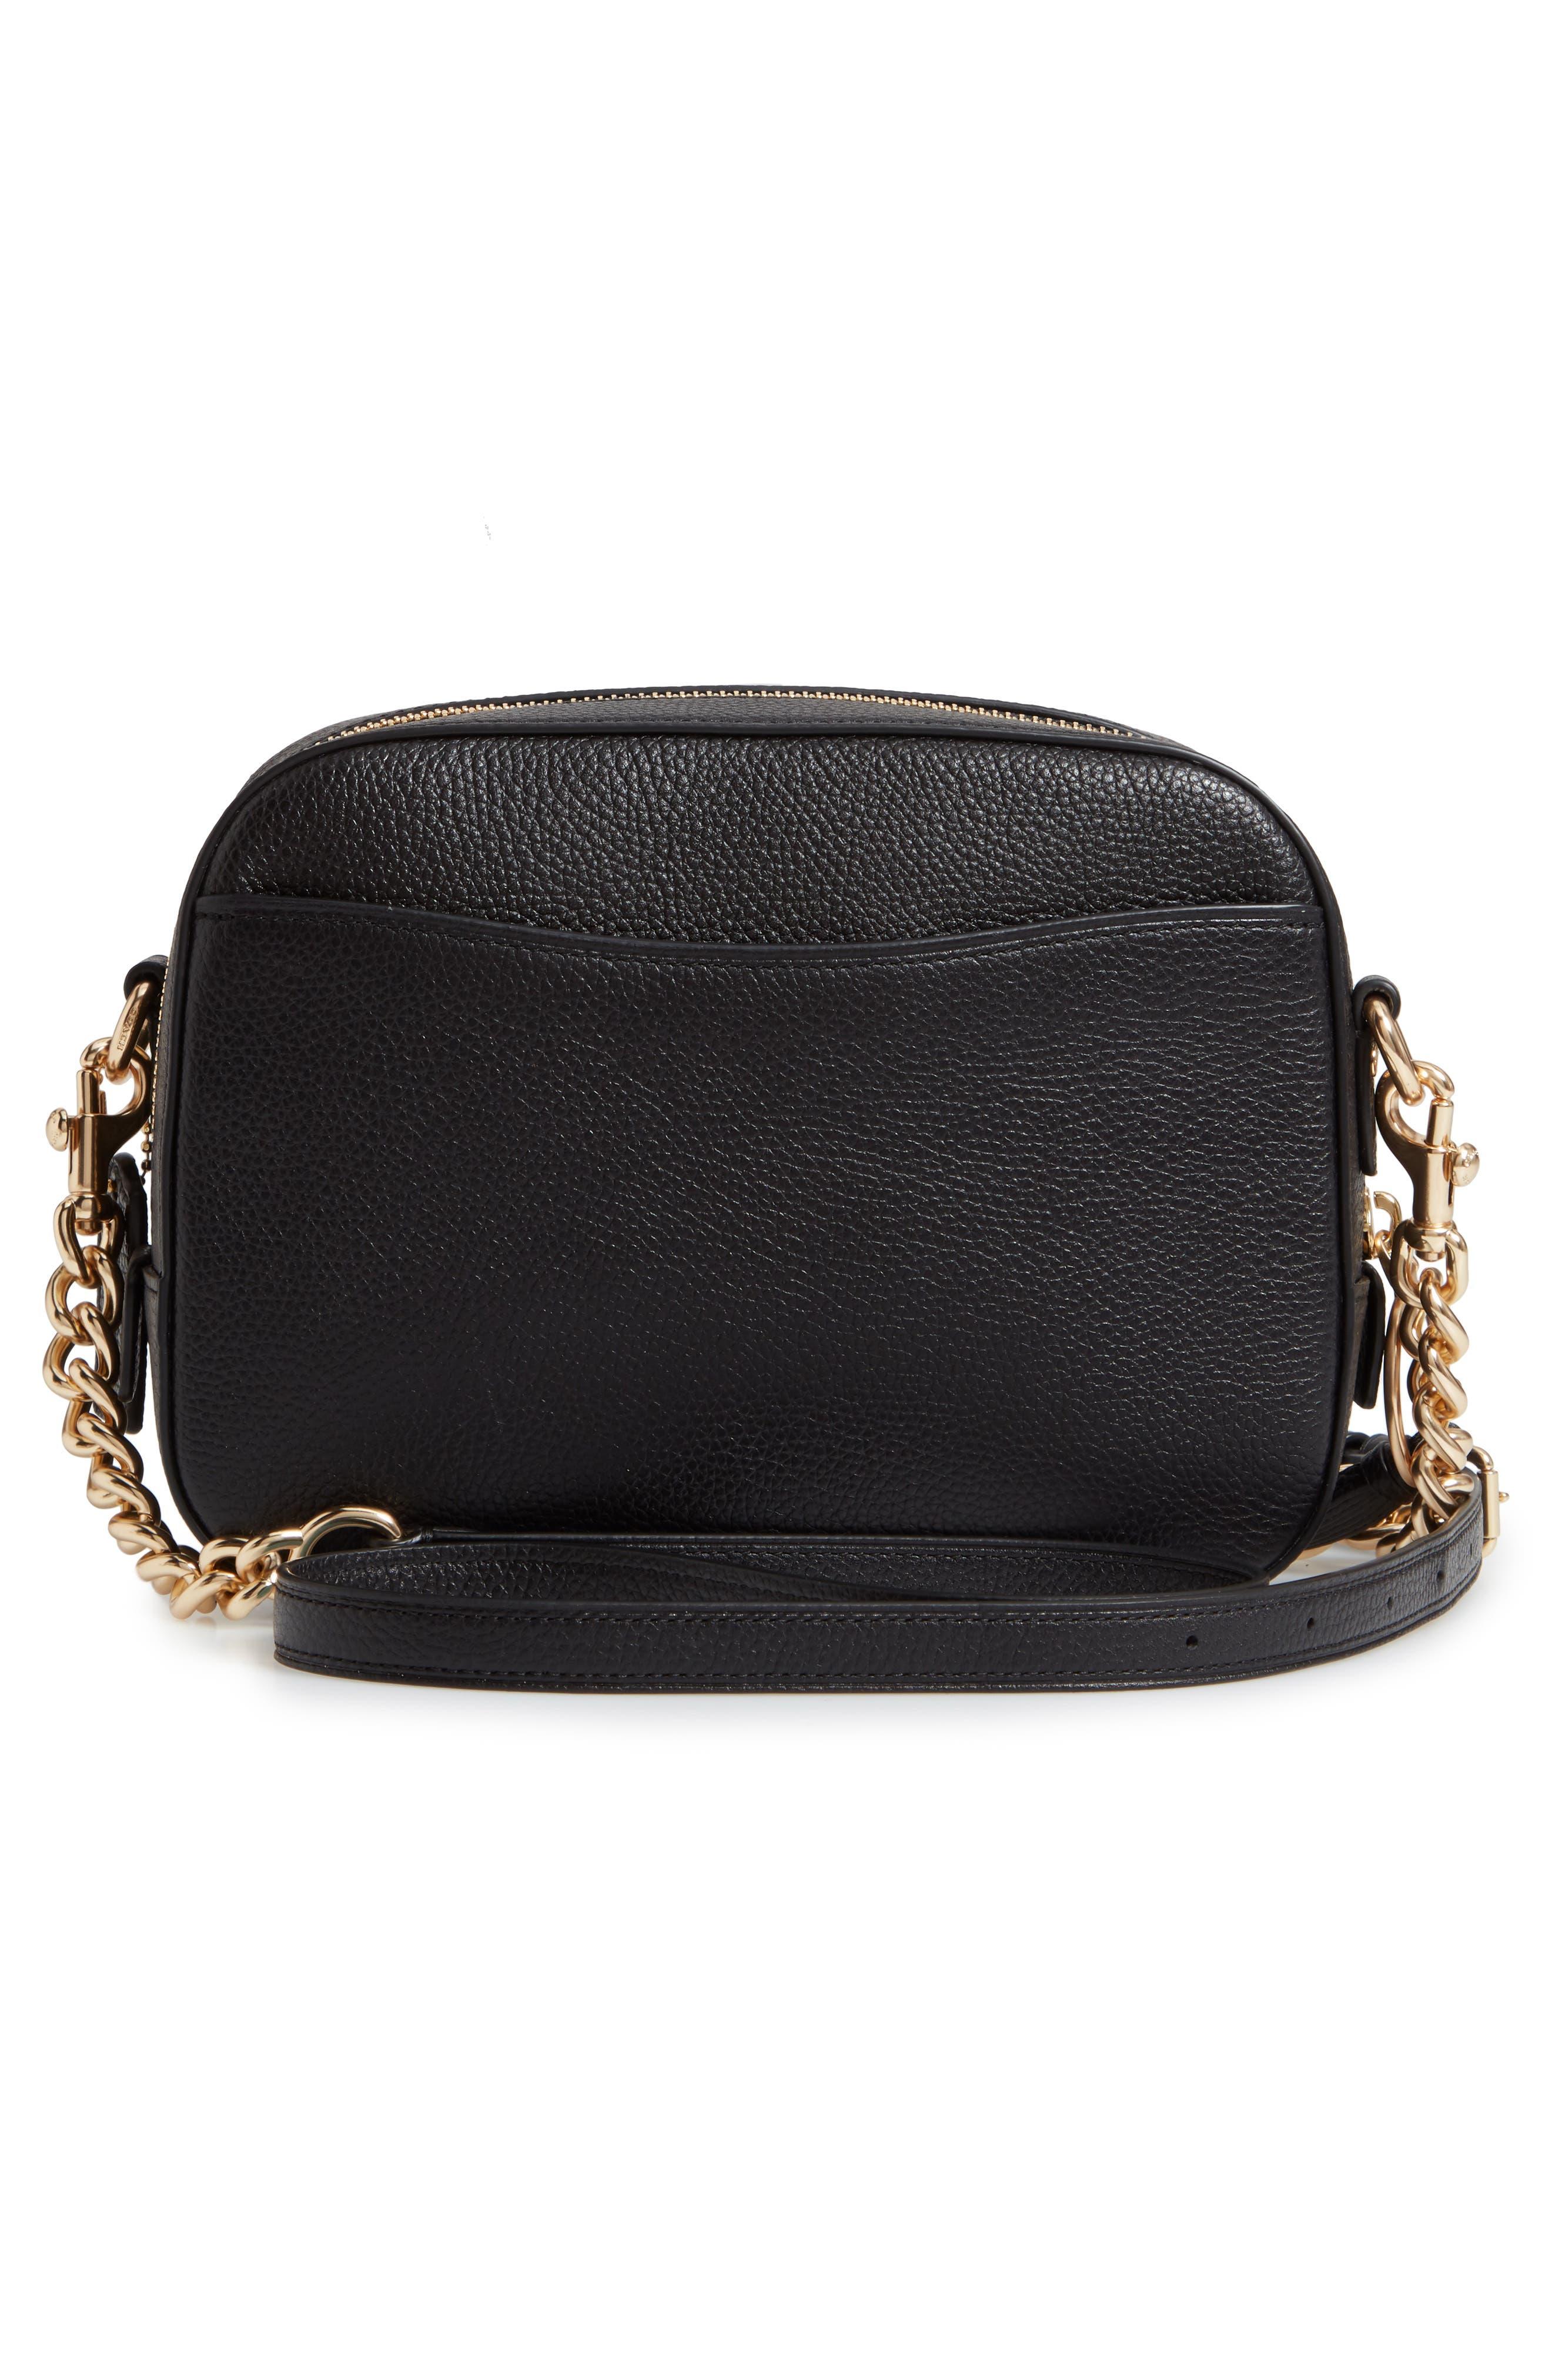 COACH, Pebbled Leather Camera Bag, Alternate thumbnail 4, color, BLACK